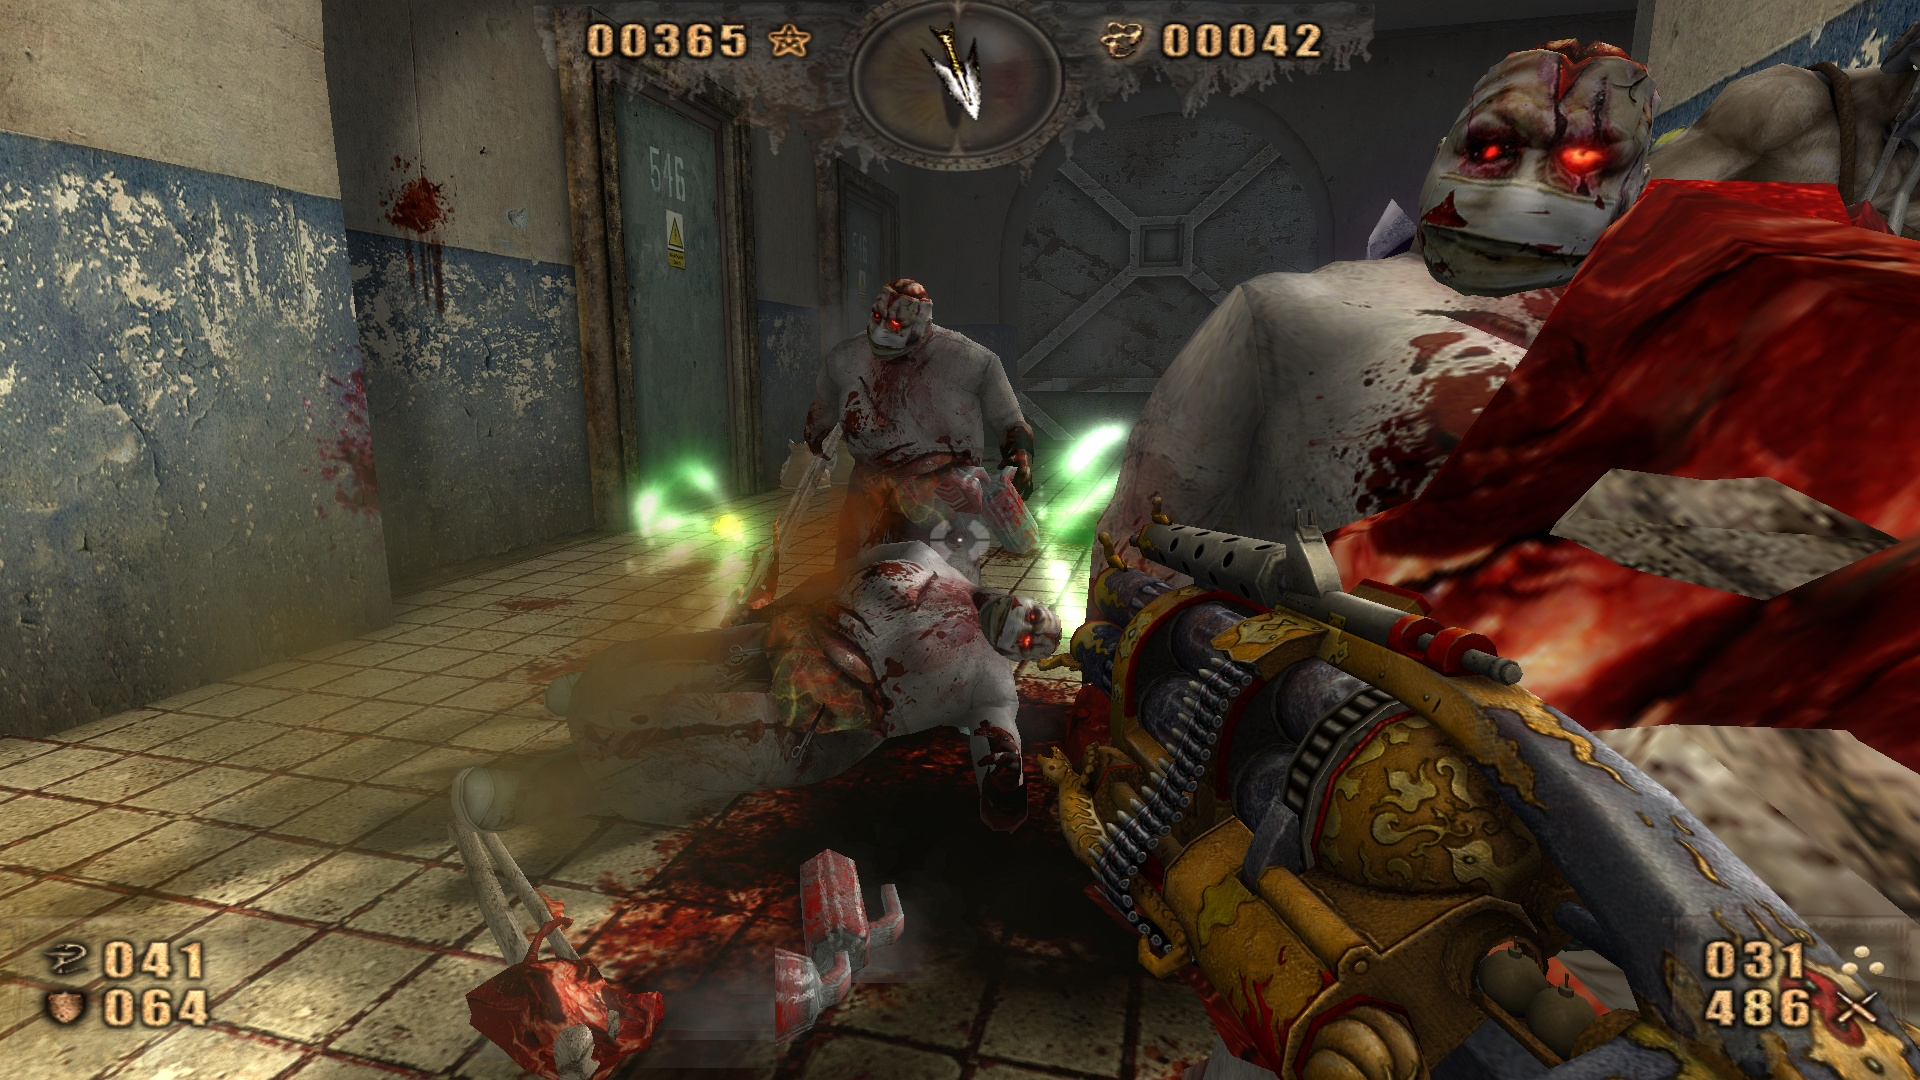 Скриншоты к игре Painkiller Redemption, screenshot, обои, игры